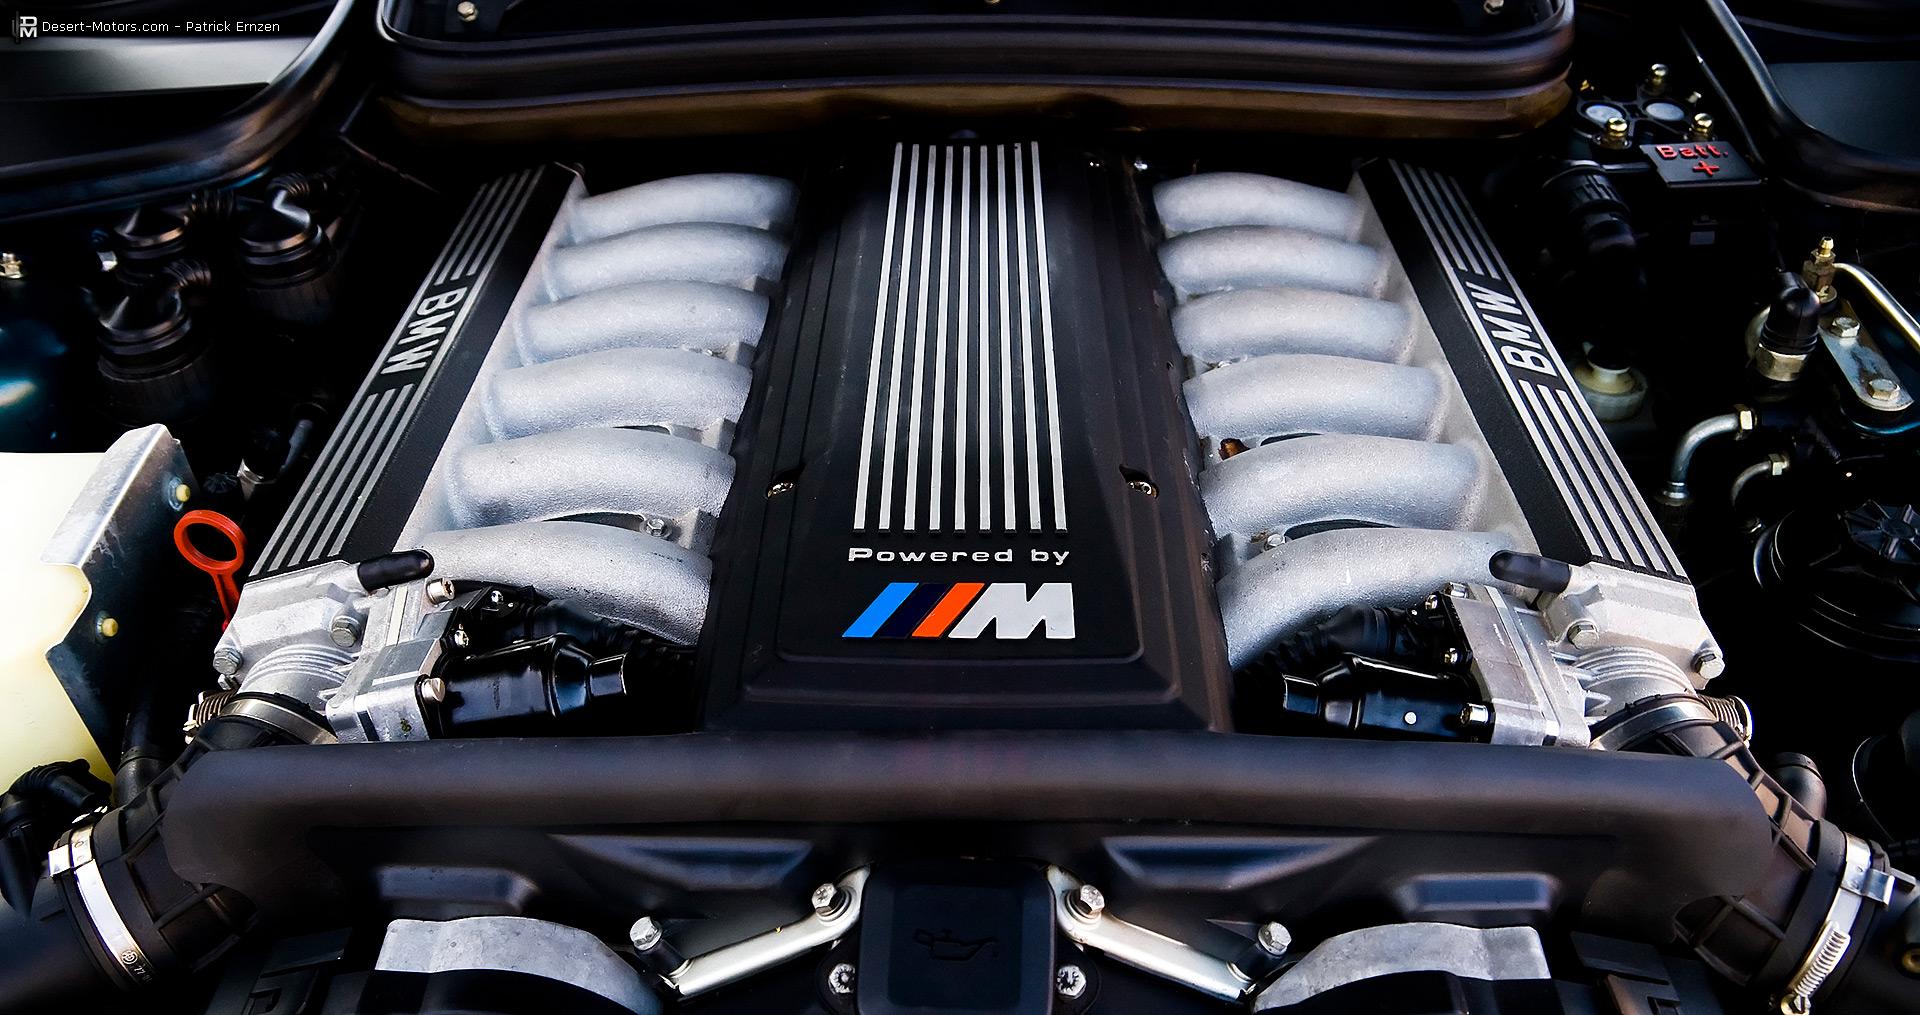 Post your best hi res BMW pics for desktop backgrounds